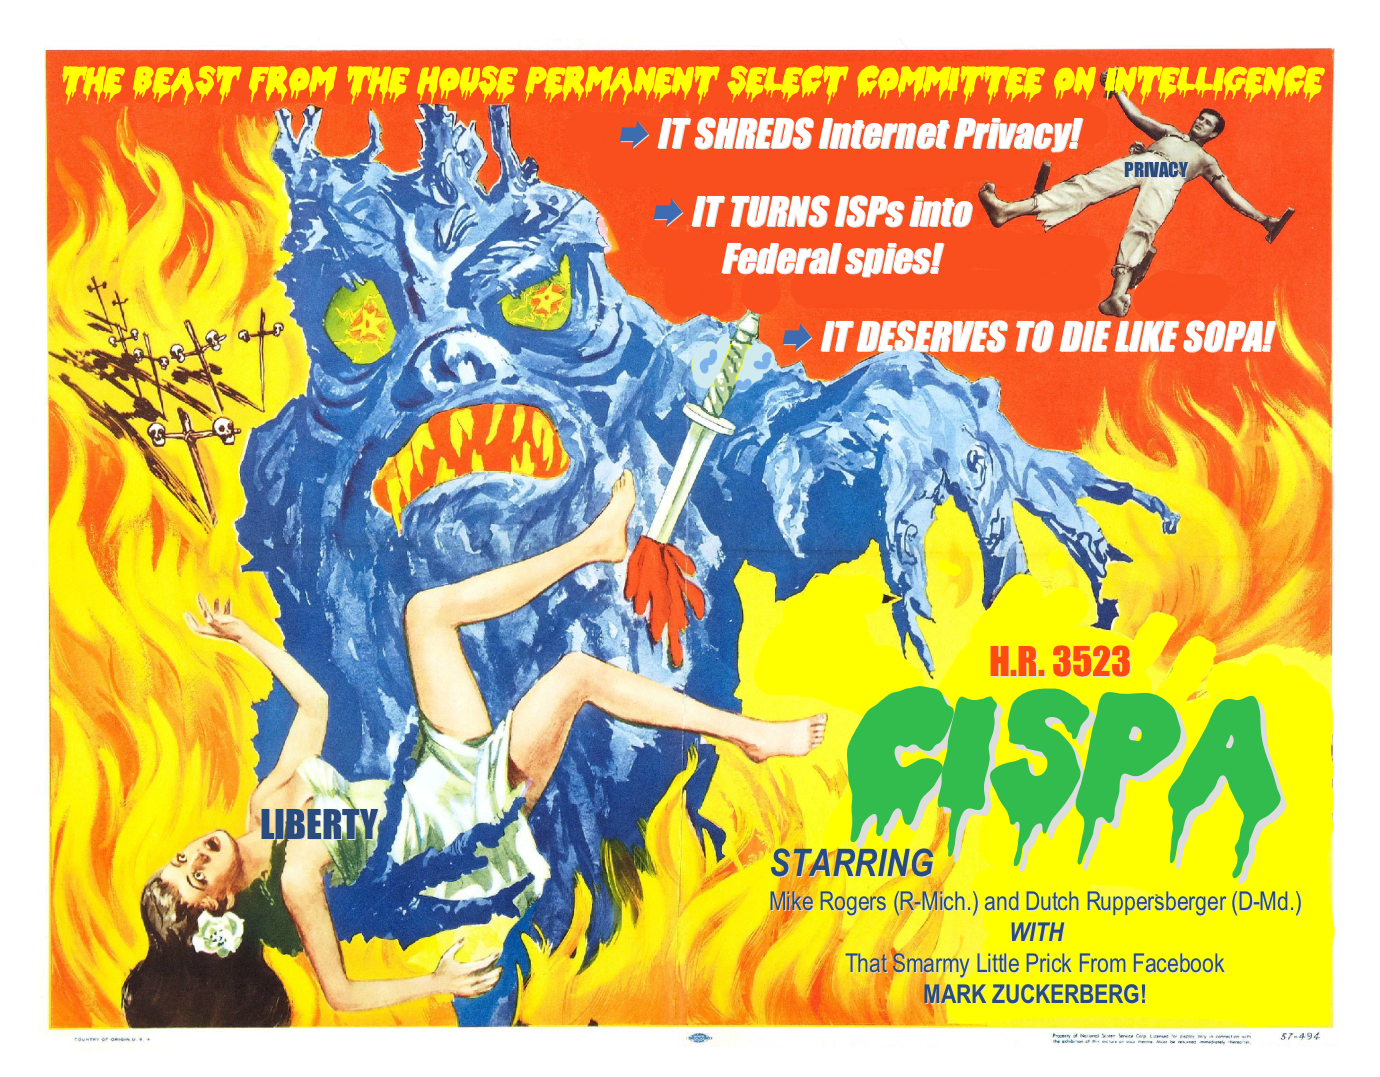 CISPA by poasterchild